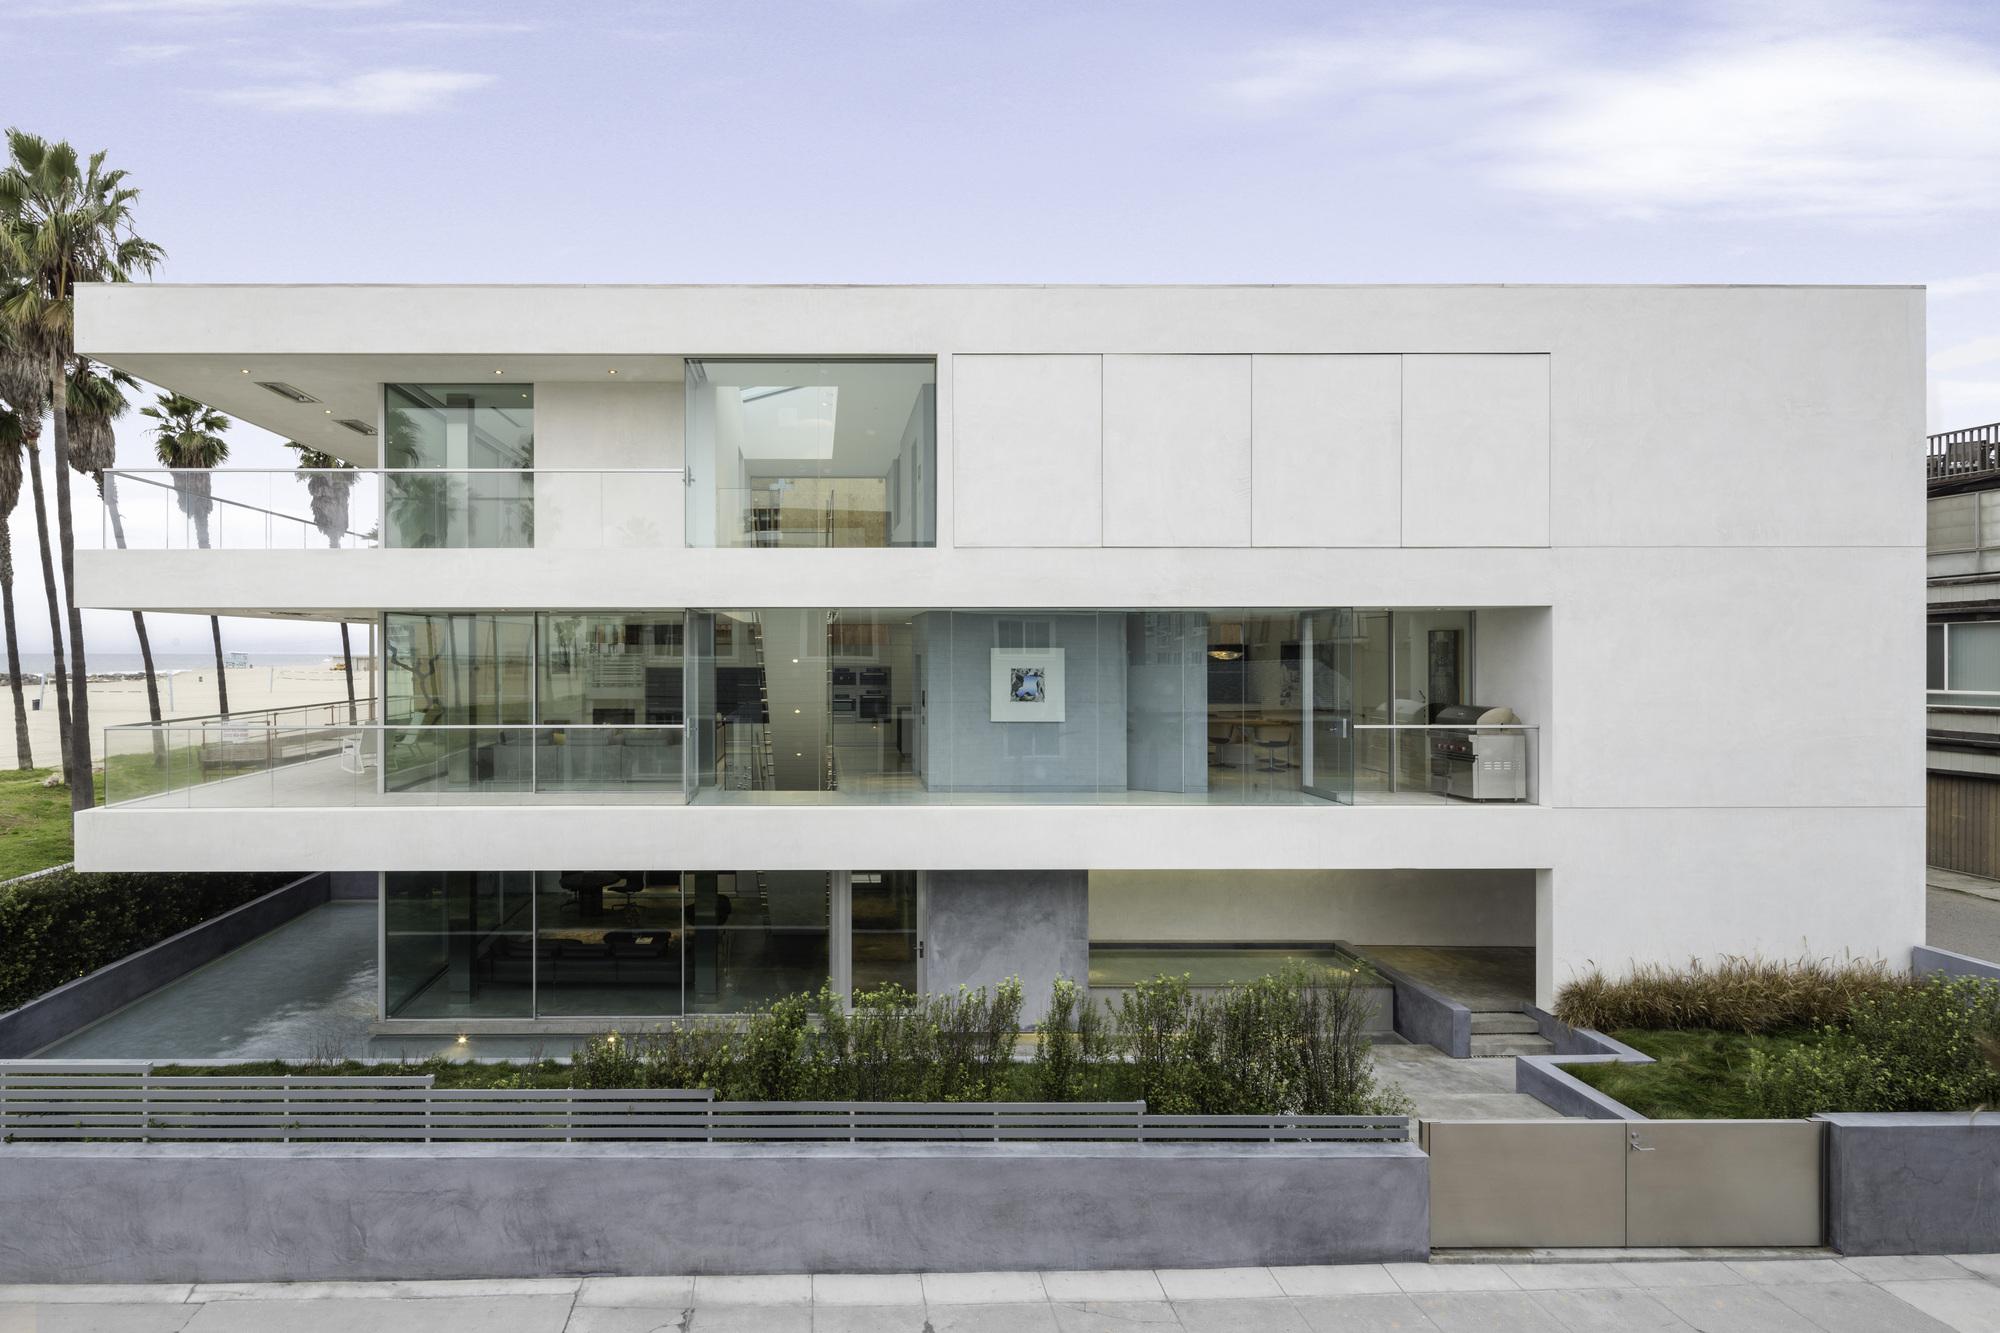 Flip flop house dan brunn architecture plataforma for What is a flip house